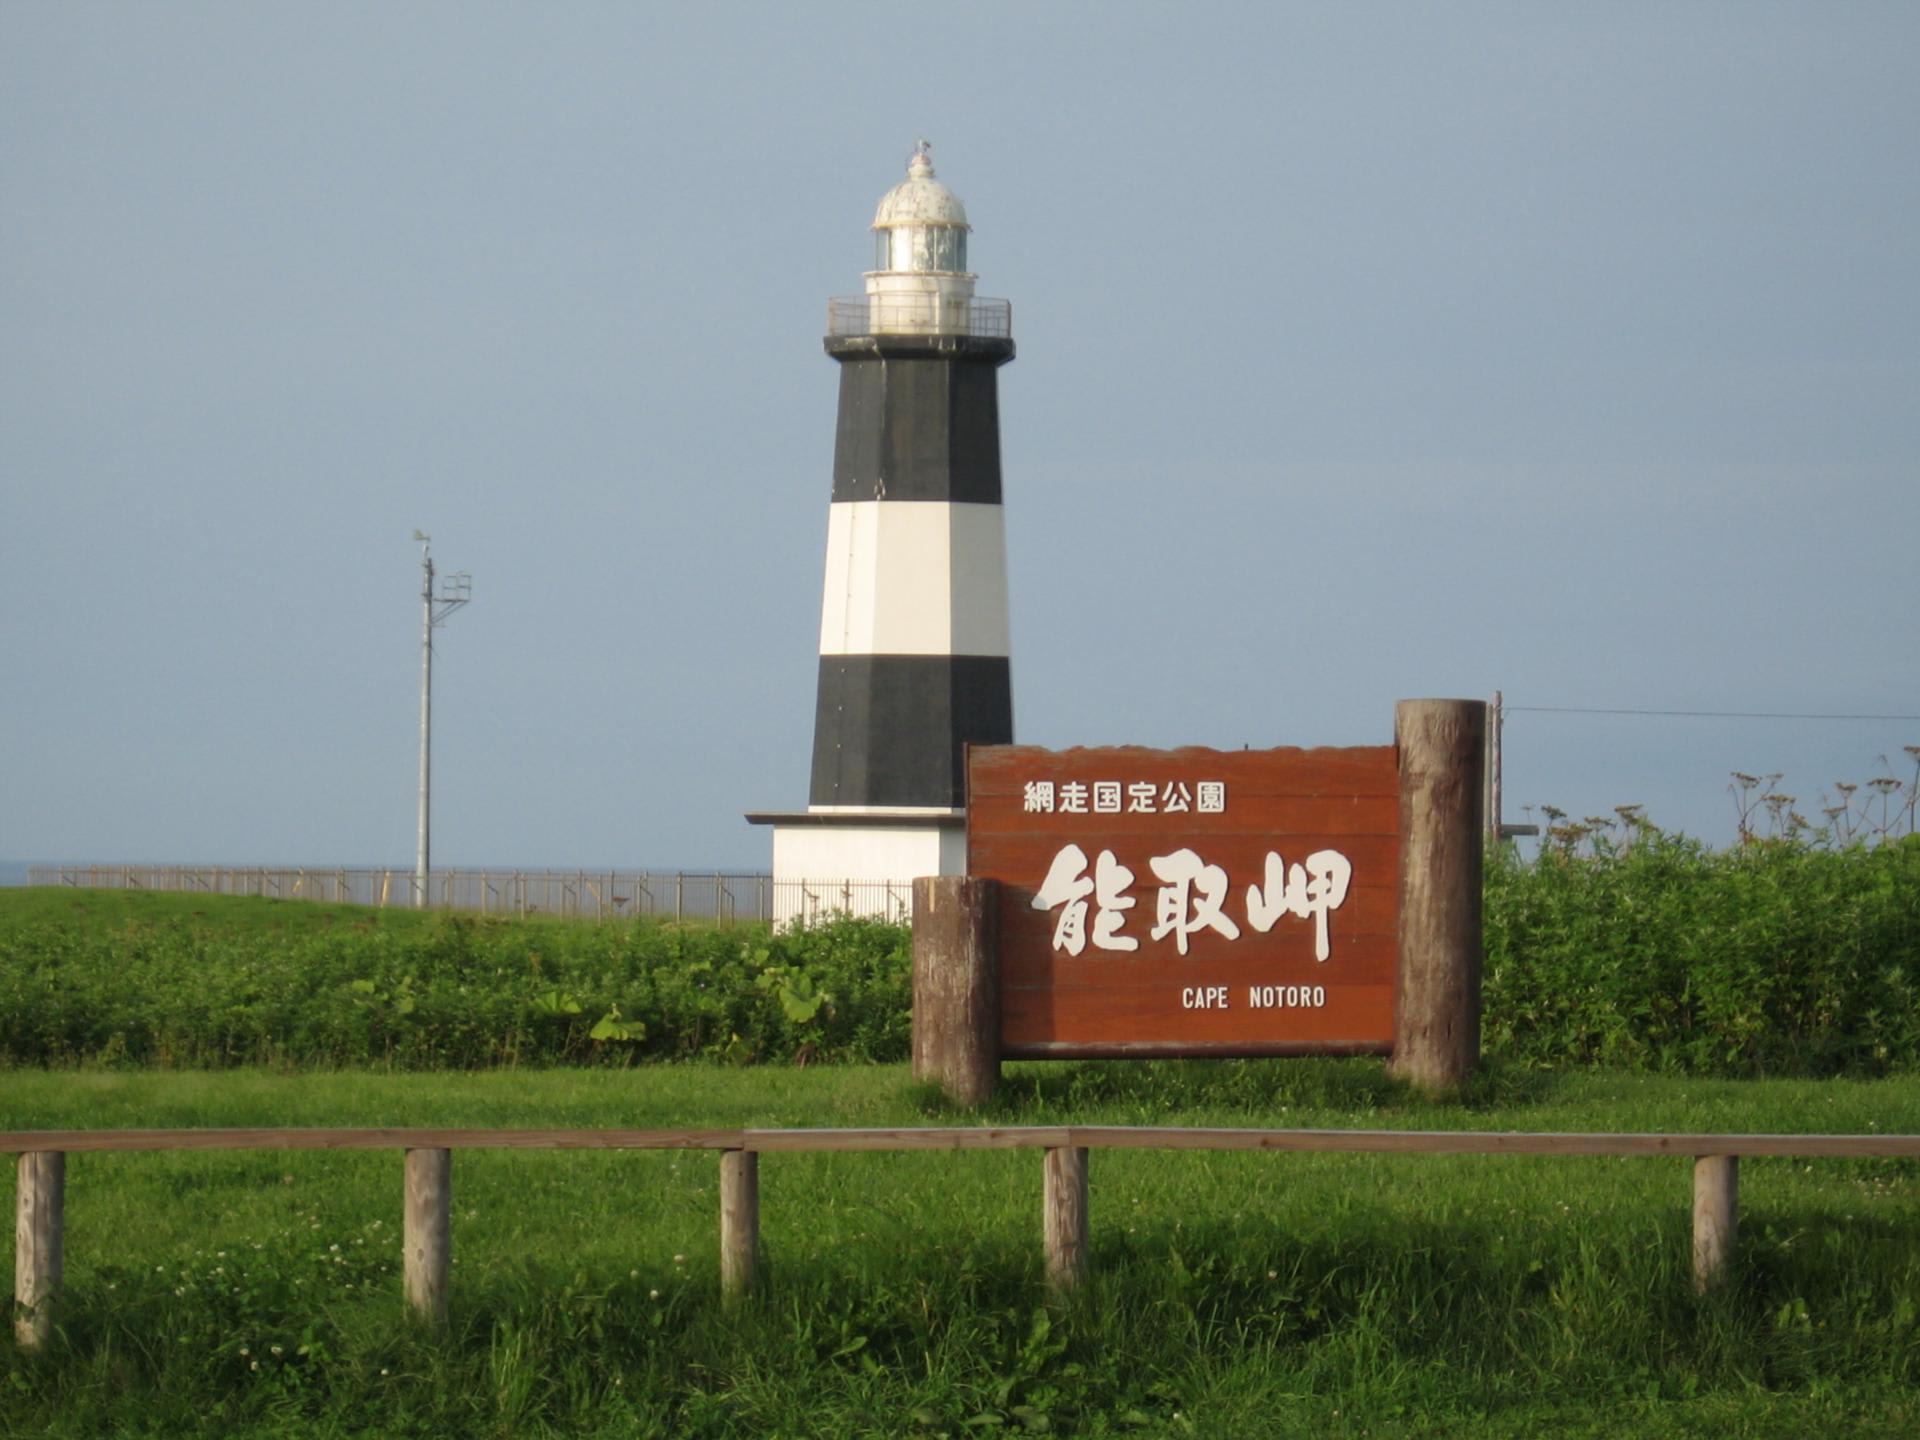 ���� ����������������������2009�07�25��26